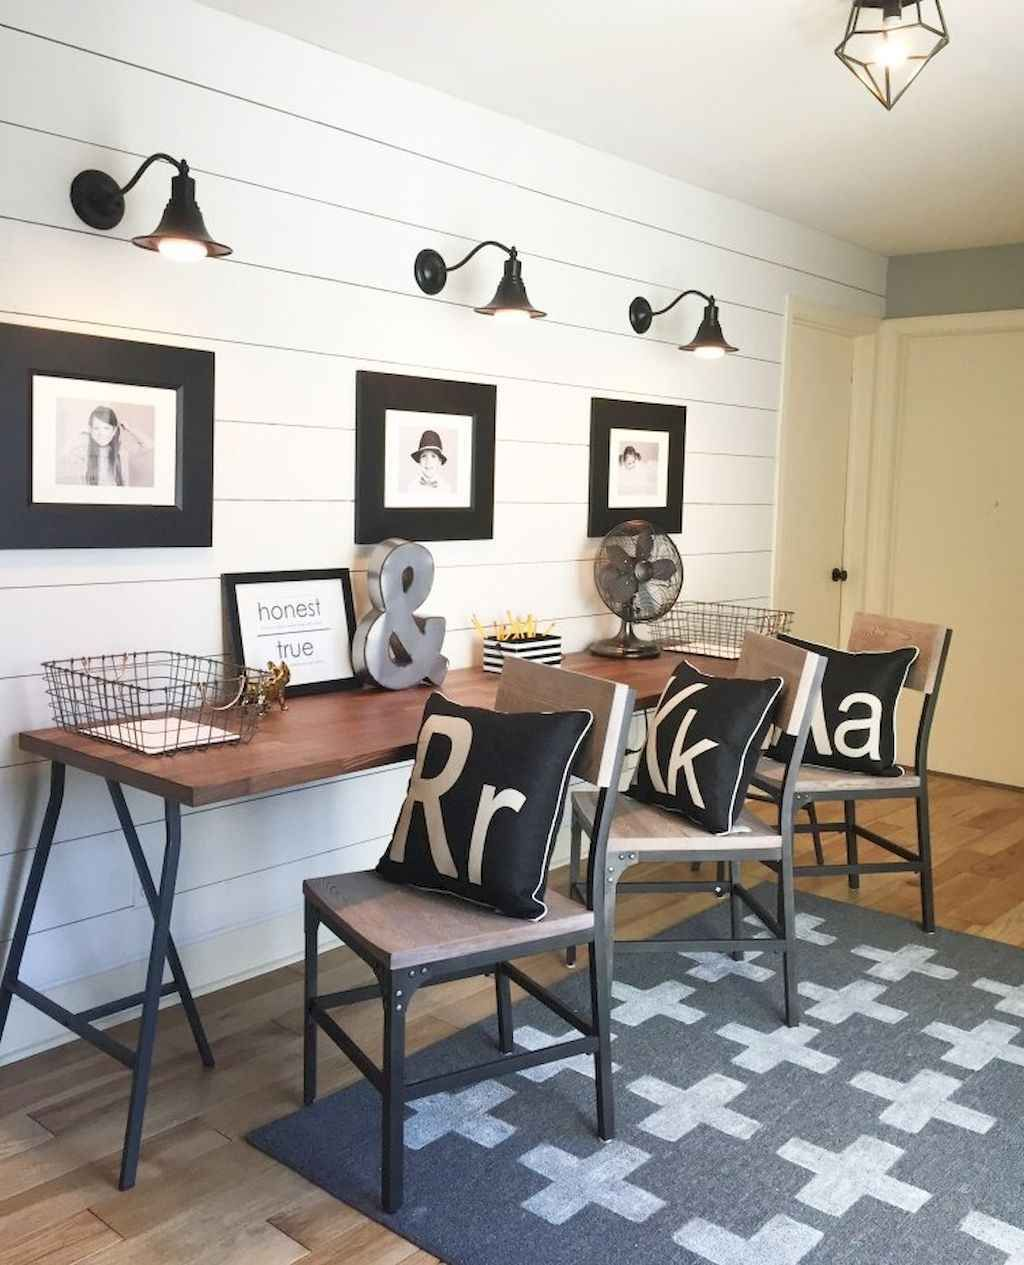 Pleasing 40 Easy Diy Farmhouse Desk Decor Ideas On A Budget 8 In Download Free Architecture Designs Scobabritishbridgeorg